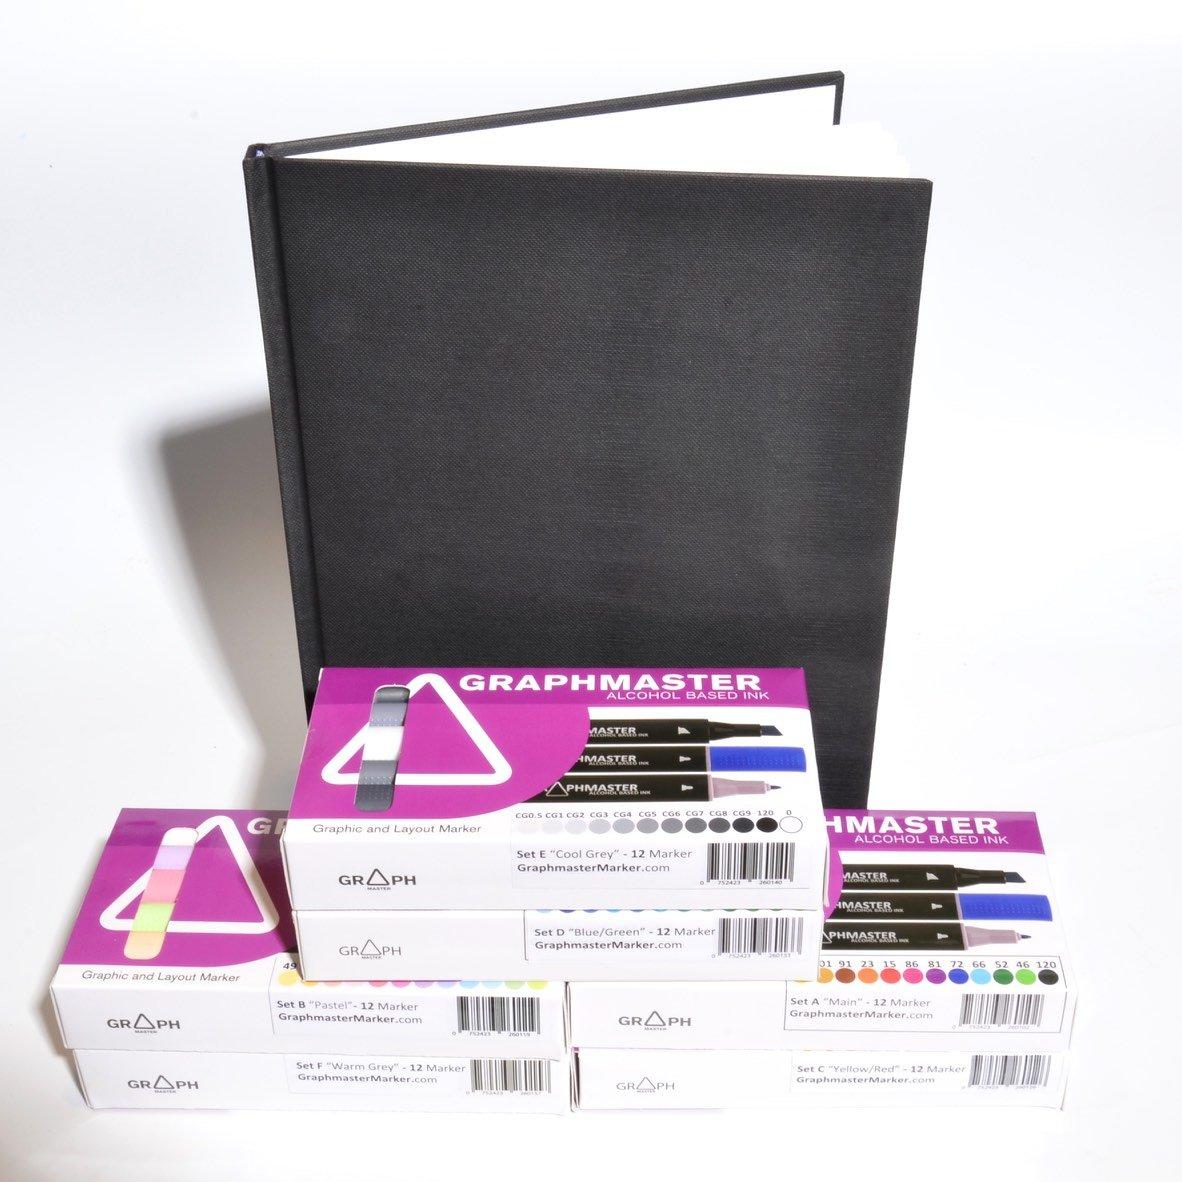 Graphma STER Mega Pack 72 Alcohol Marker + nero Book